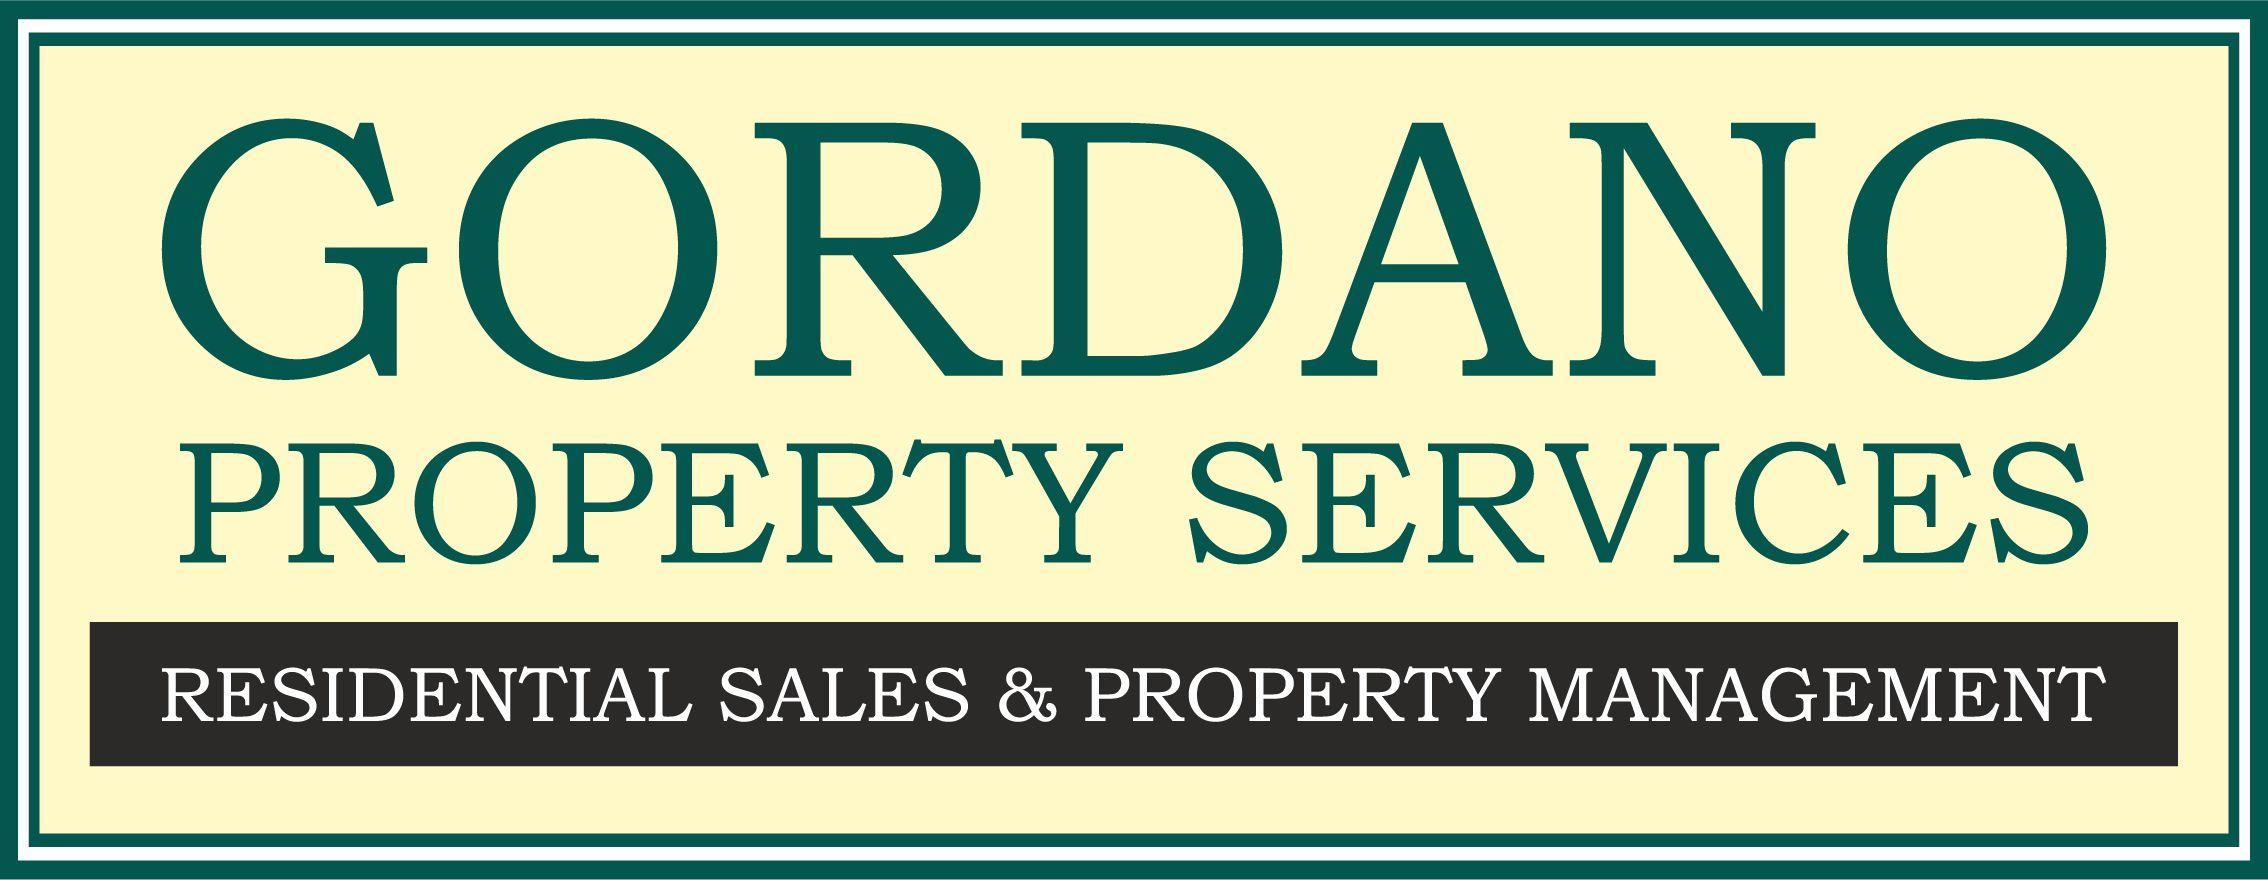 Gordano Property Services - Portishead : Letting agents in Bristol Bristol